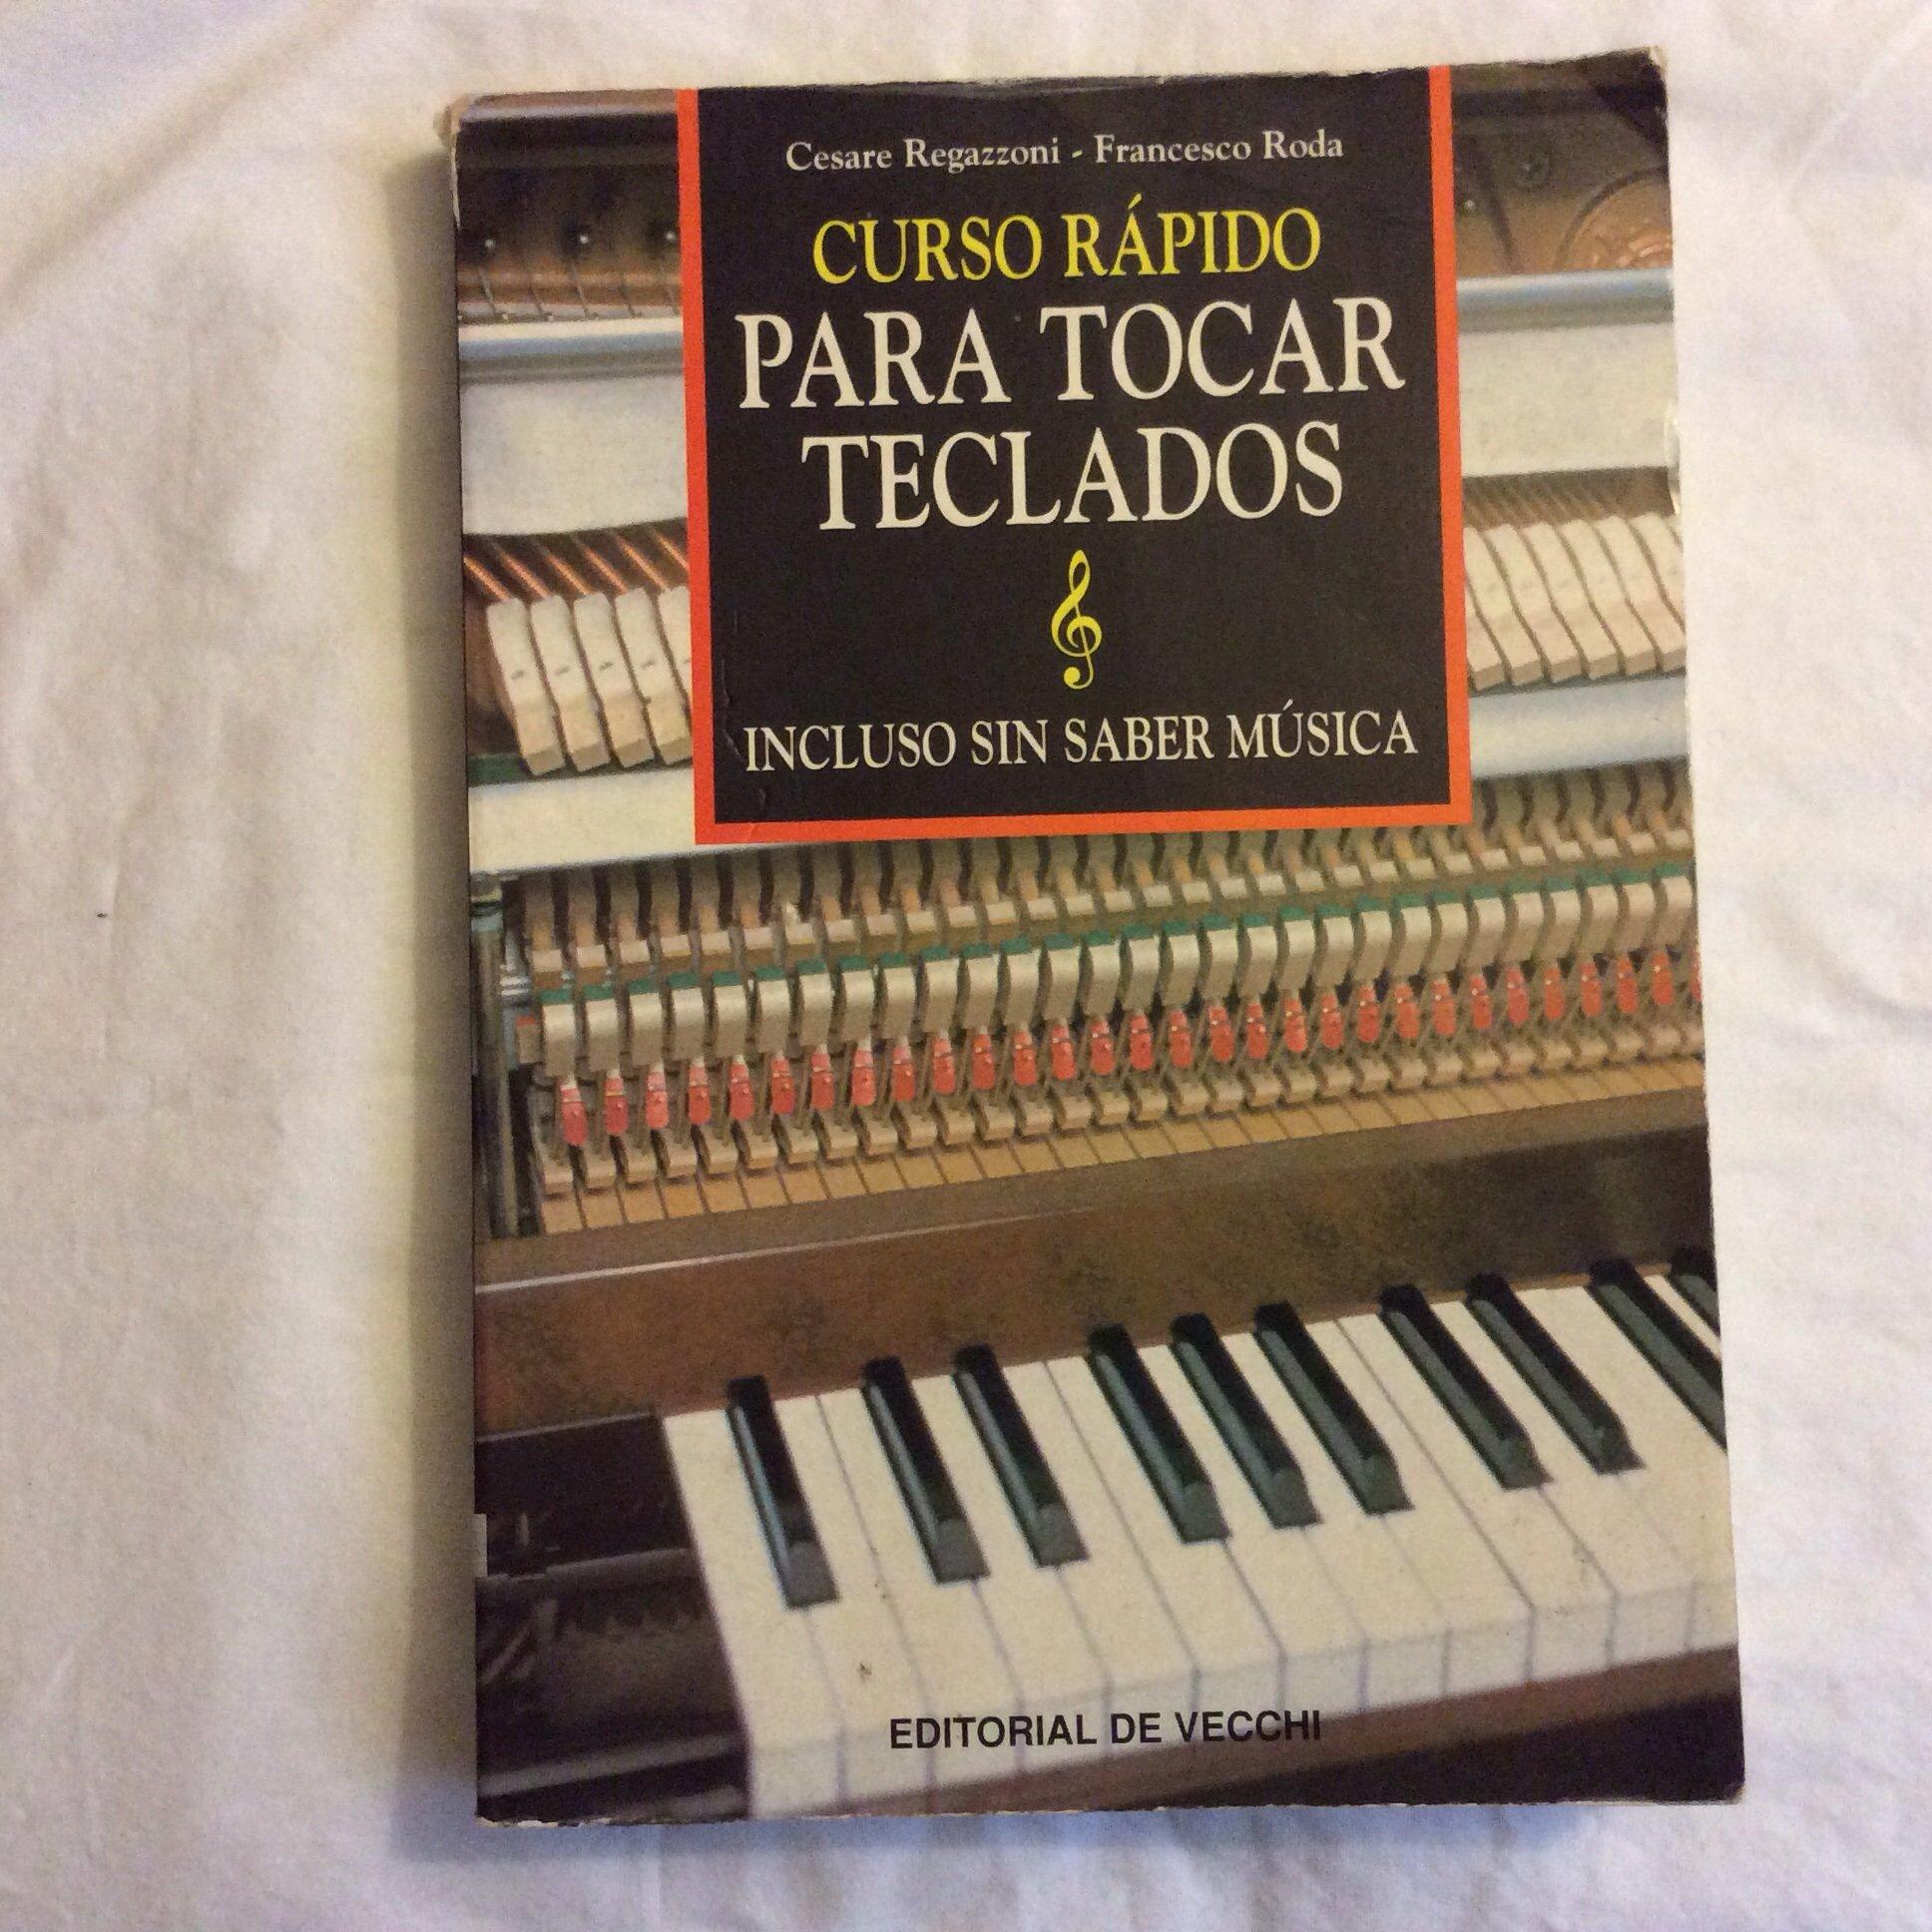 Curso Rapido Para Tocar Teclados (Spanish Edition) (Spanish) Paperback – November, 2000